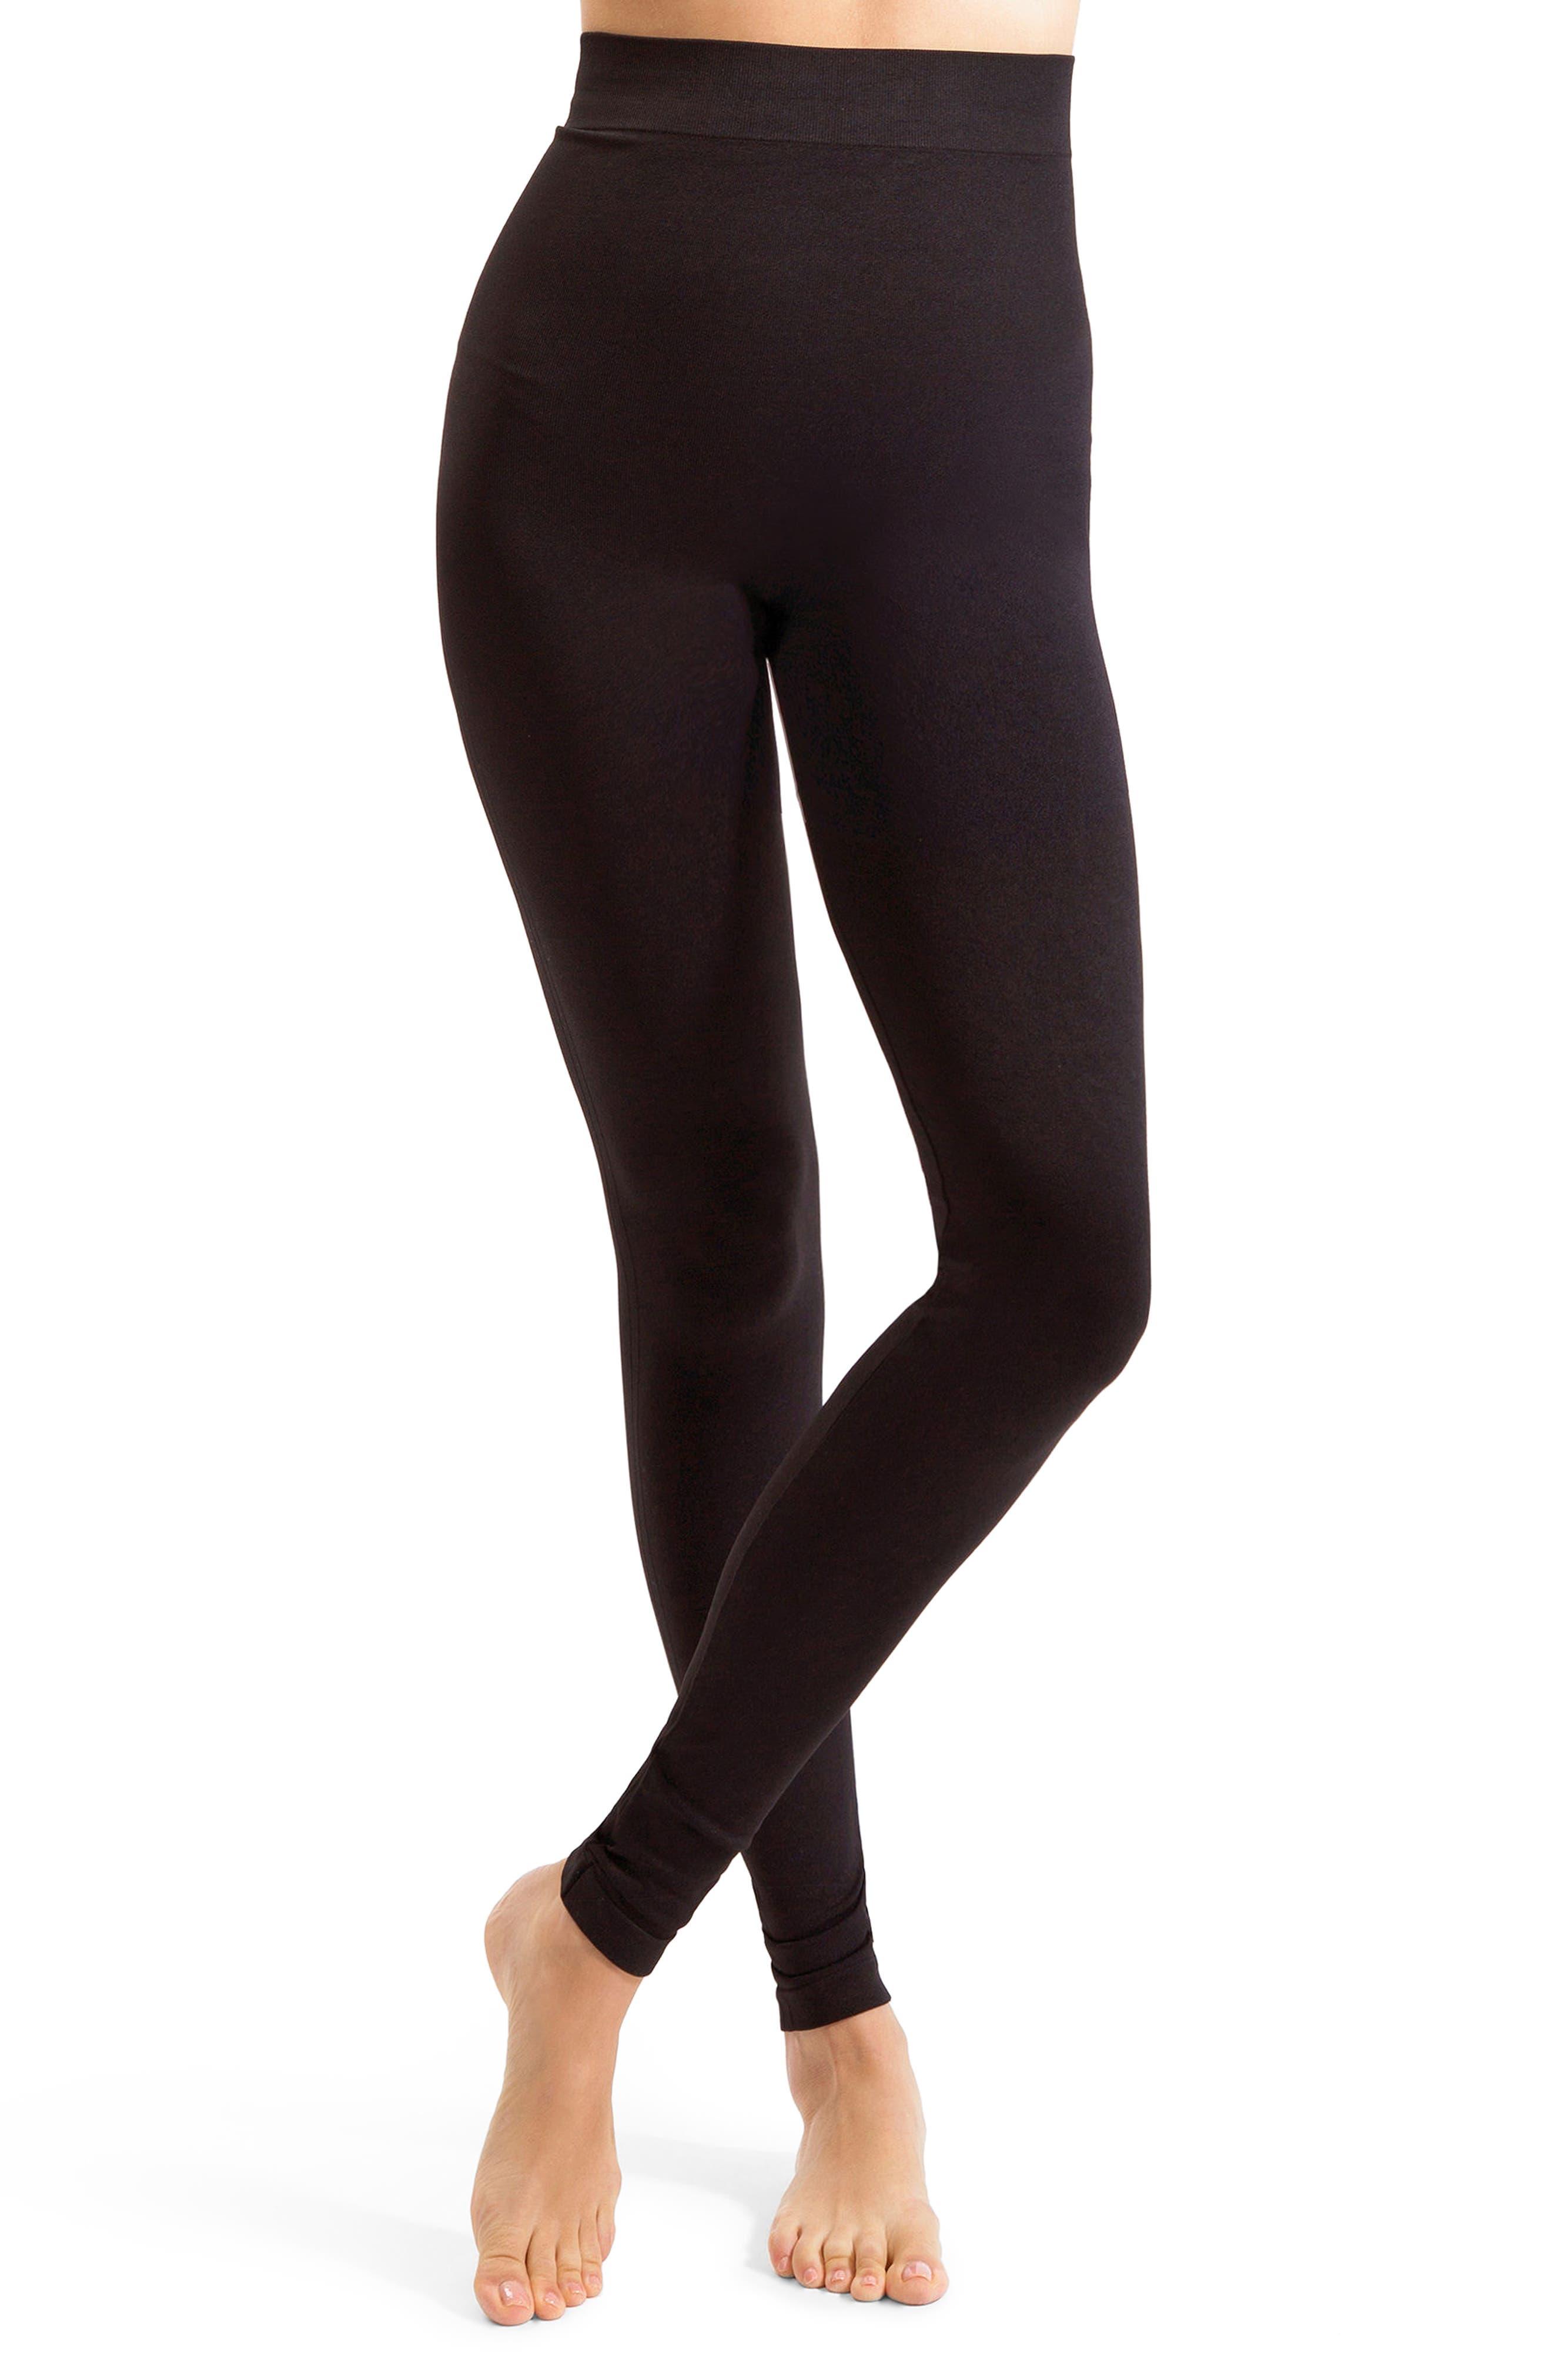 Everyday High Waist Postpartum/Nursing Leggings,                         Main,                         color, Black